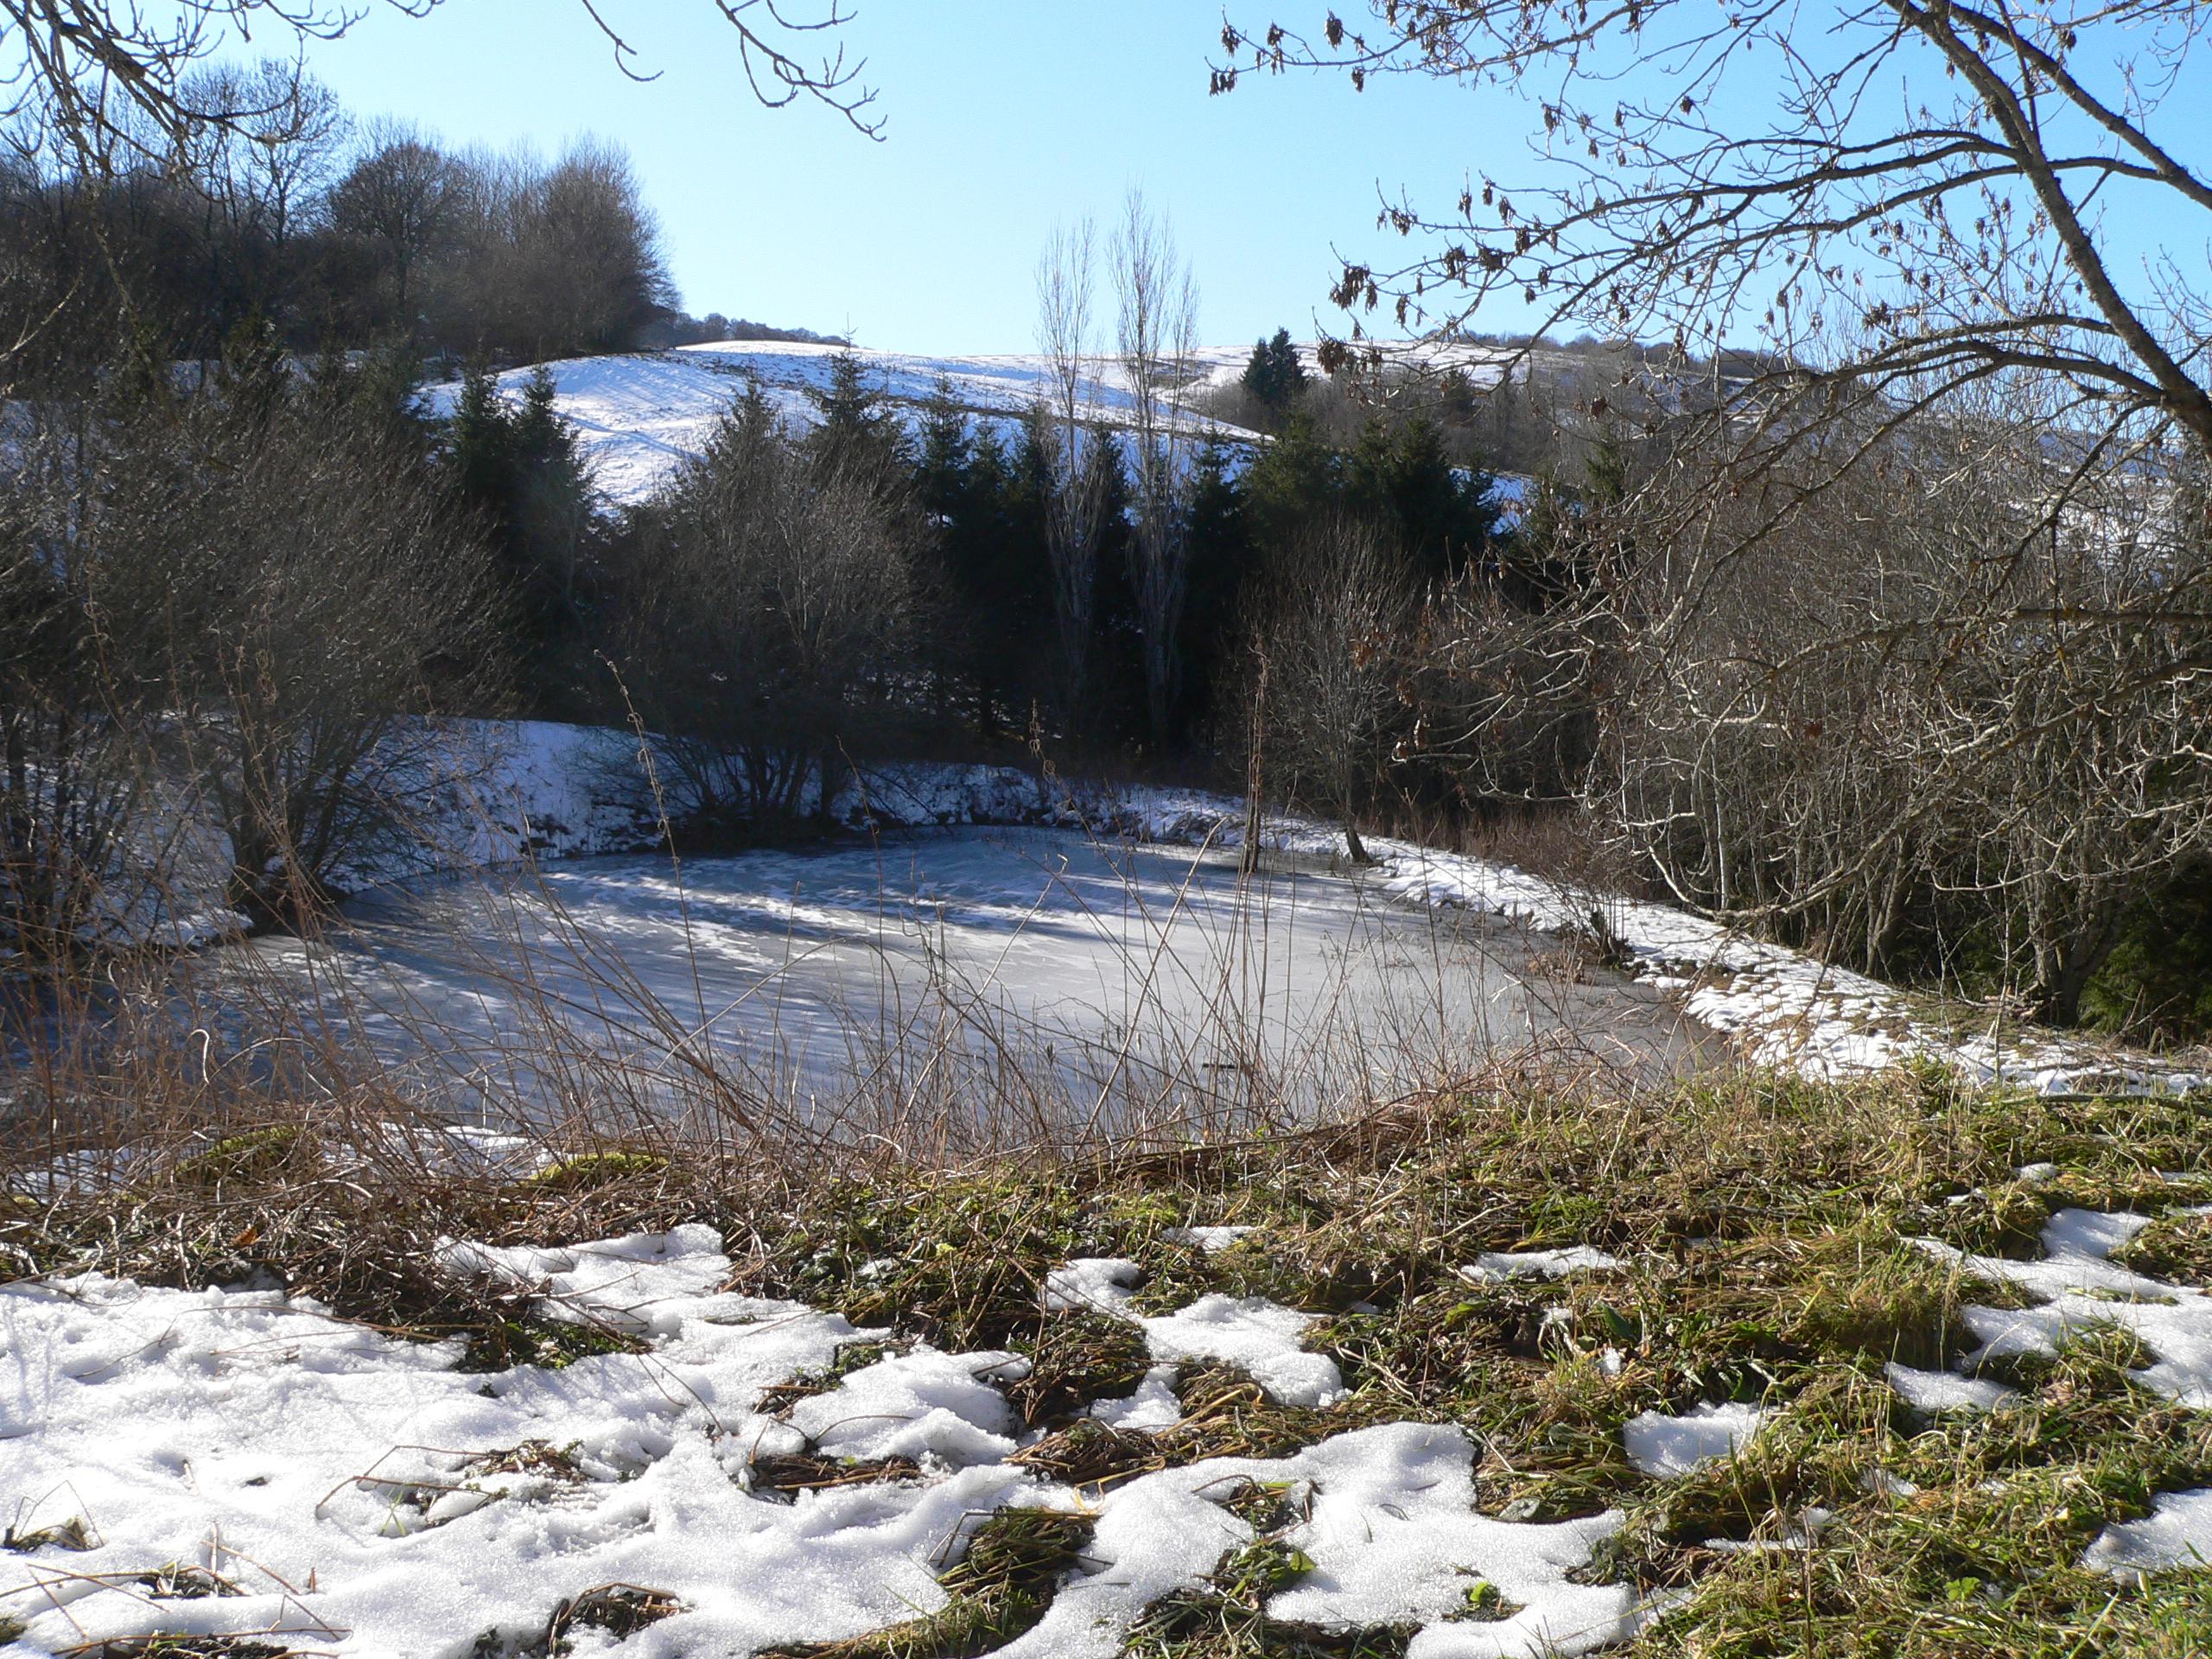 neige;étang